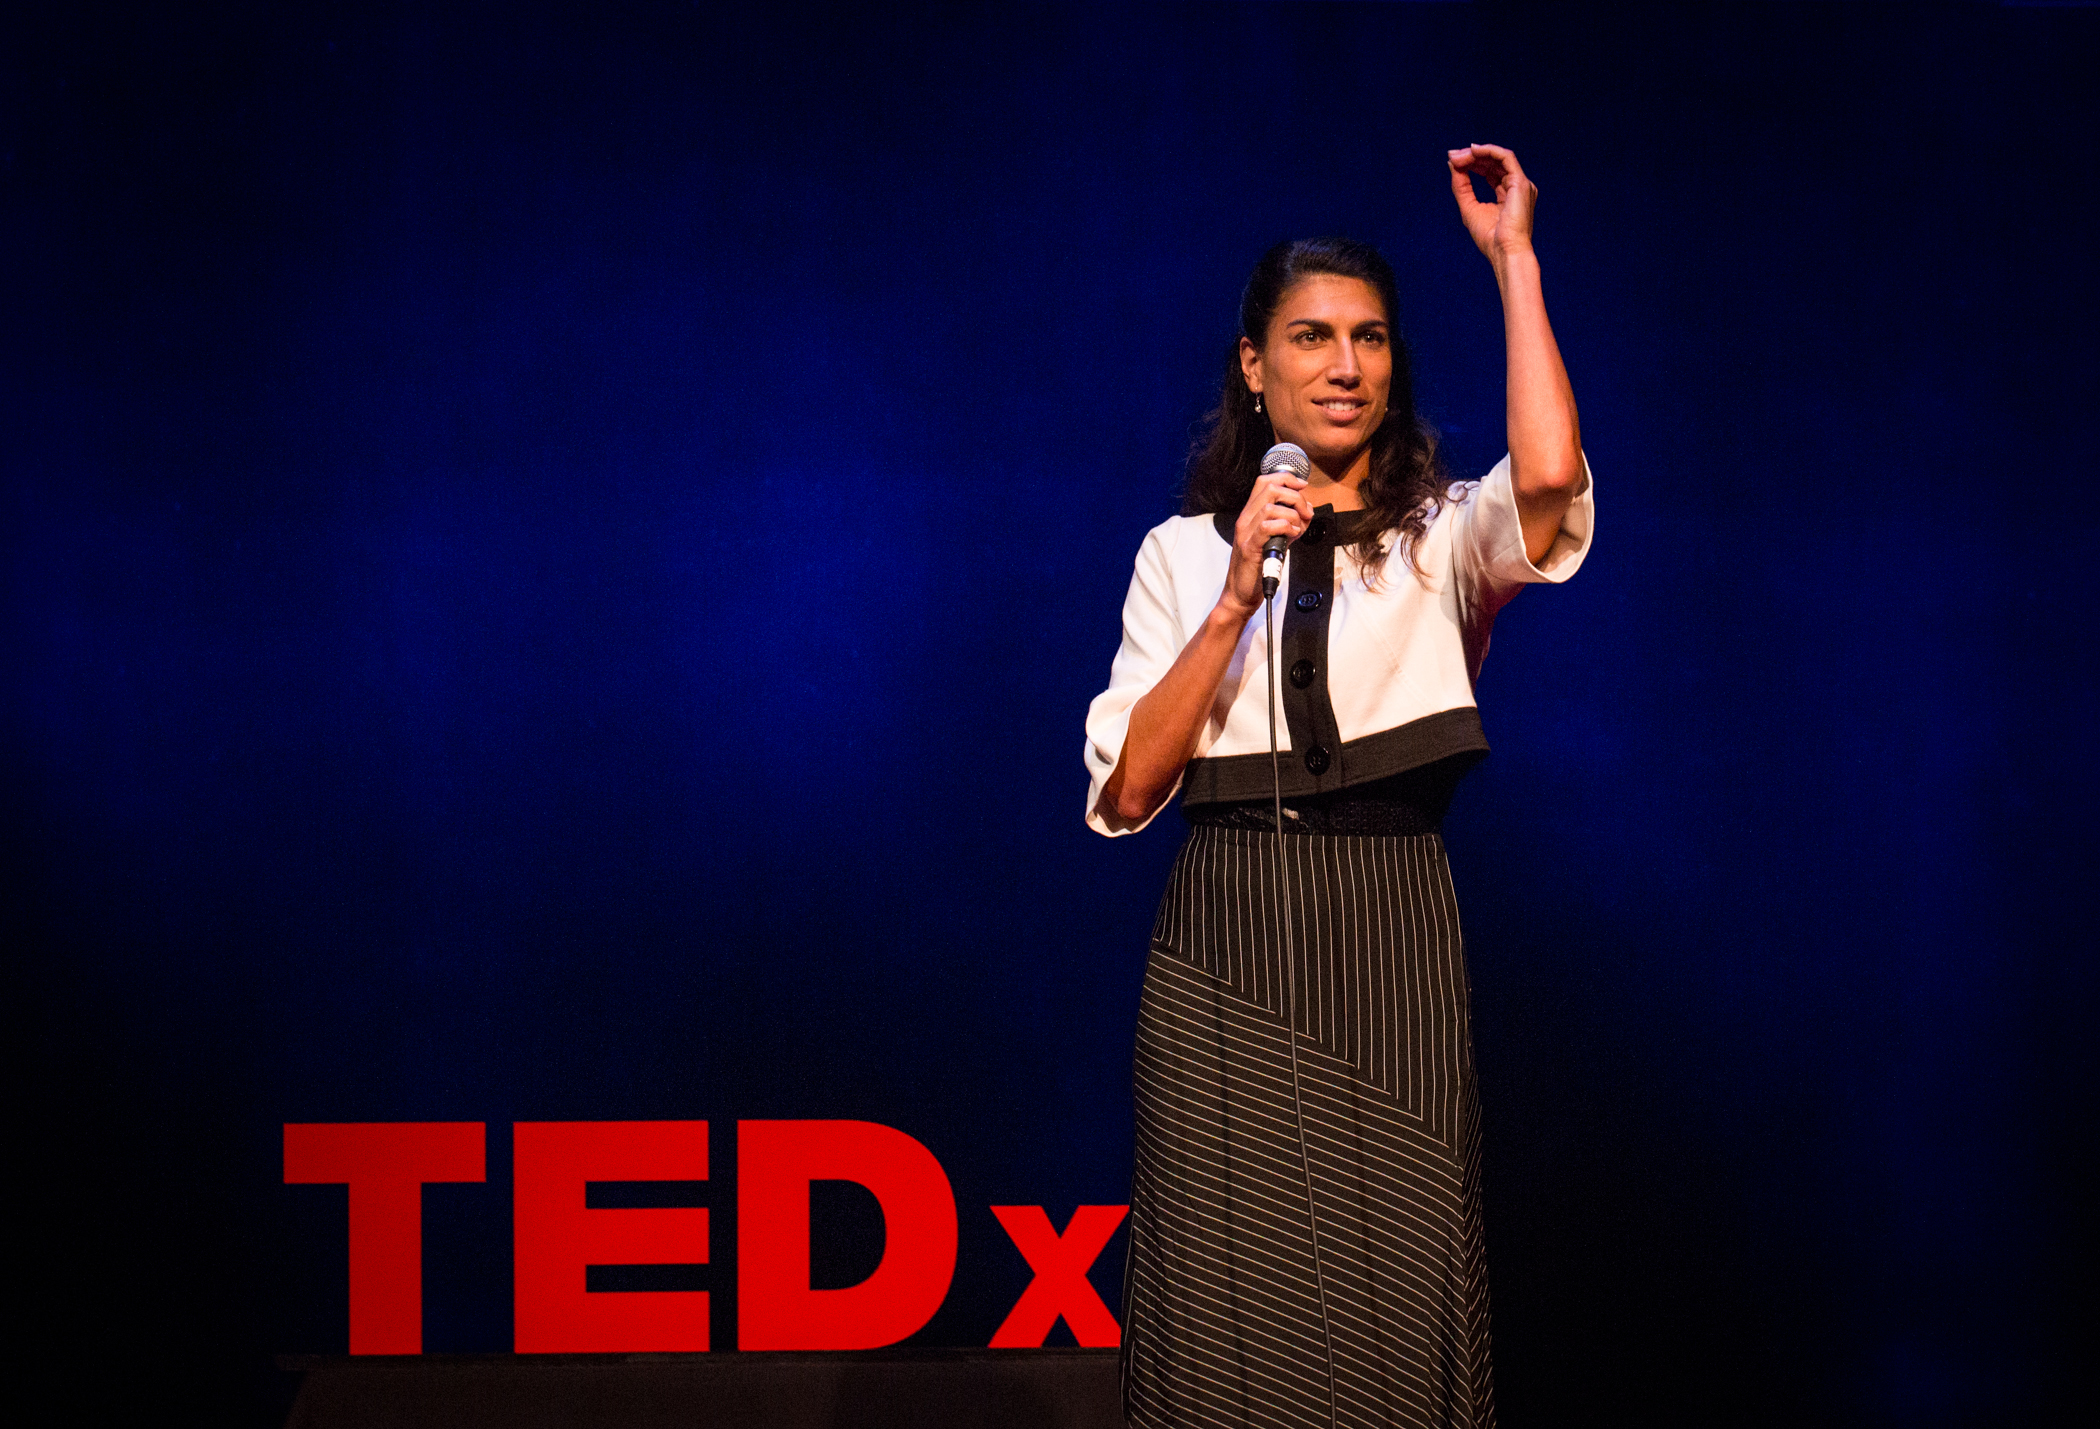 TEDxAFC-6236_hi-res